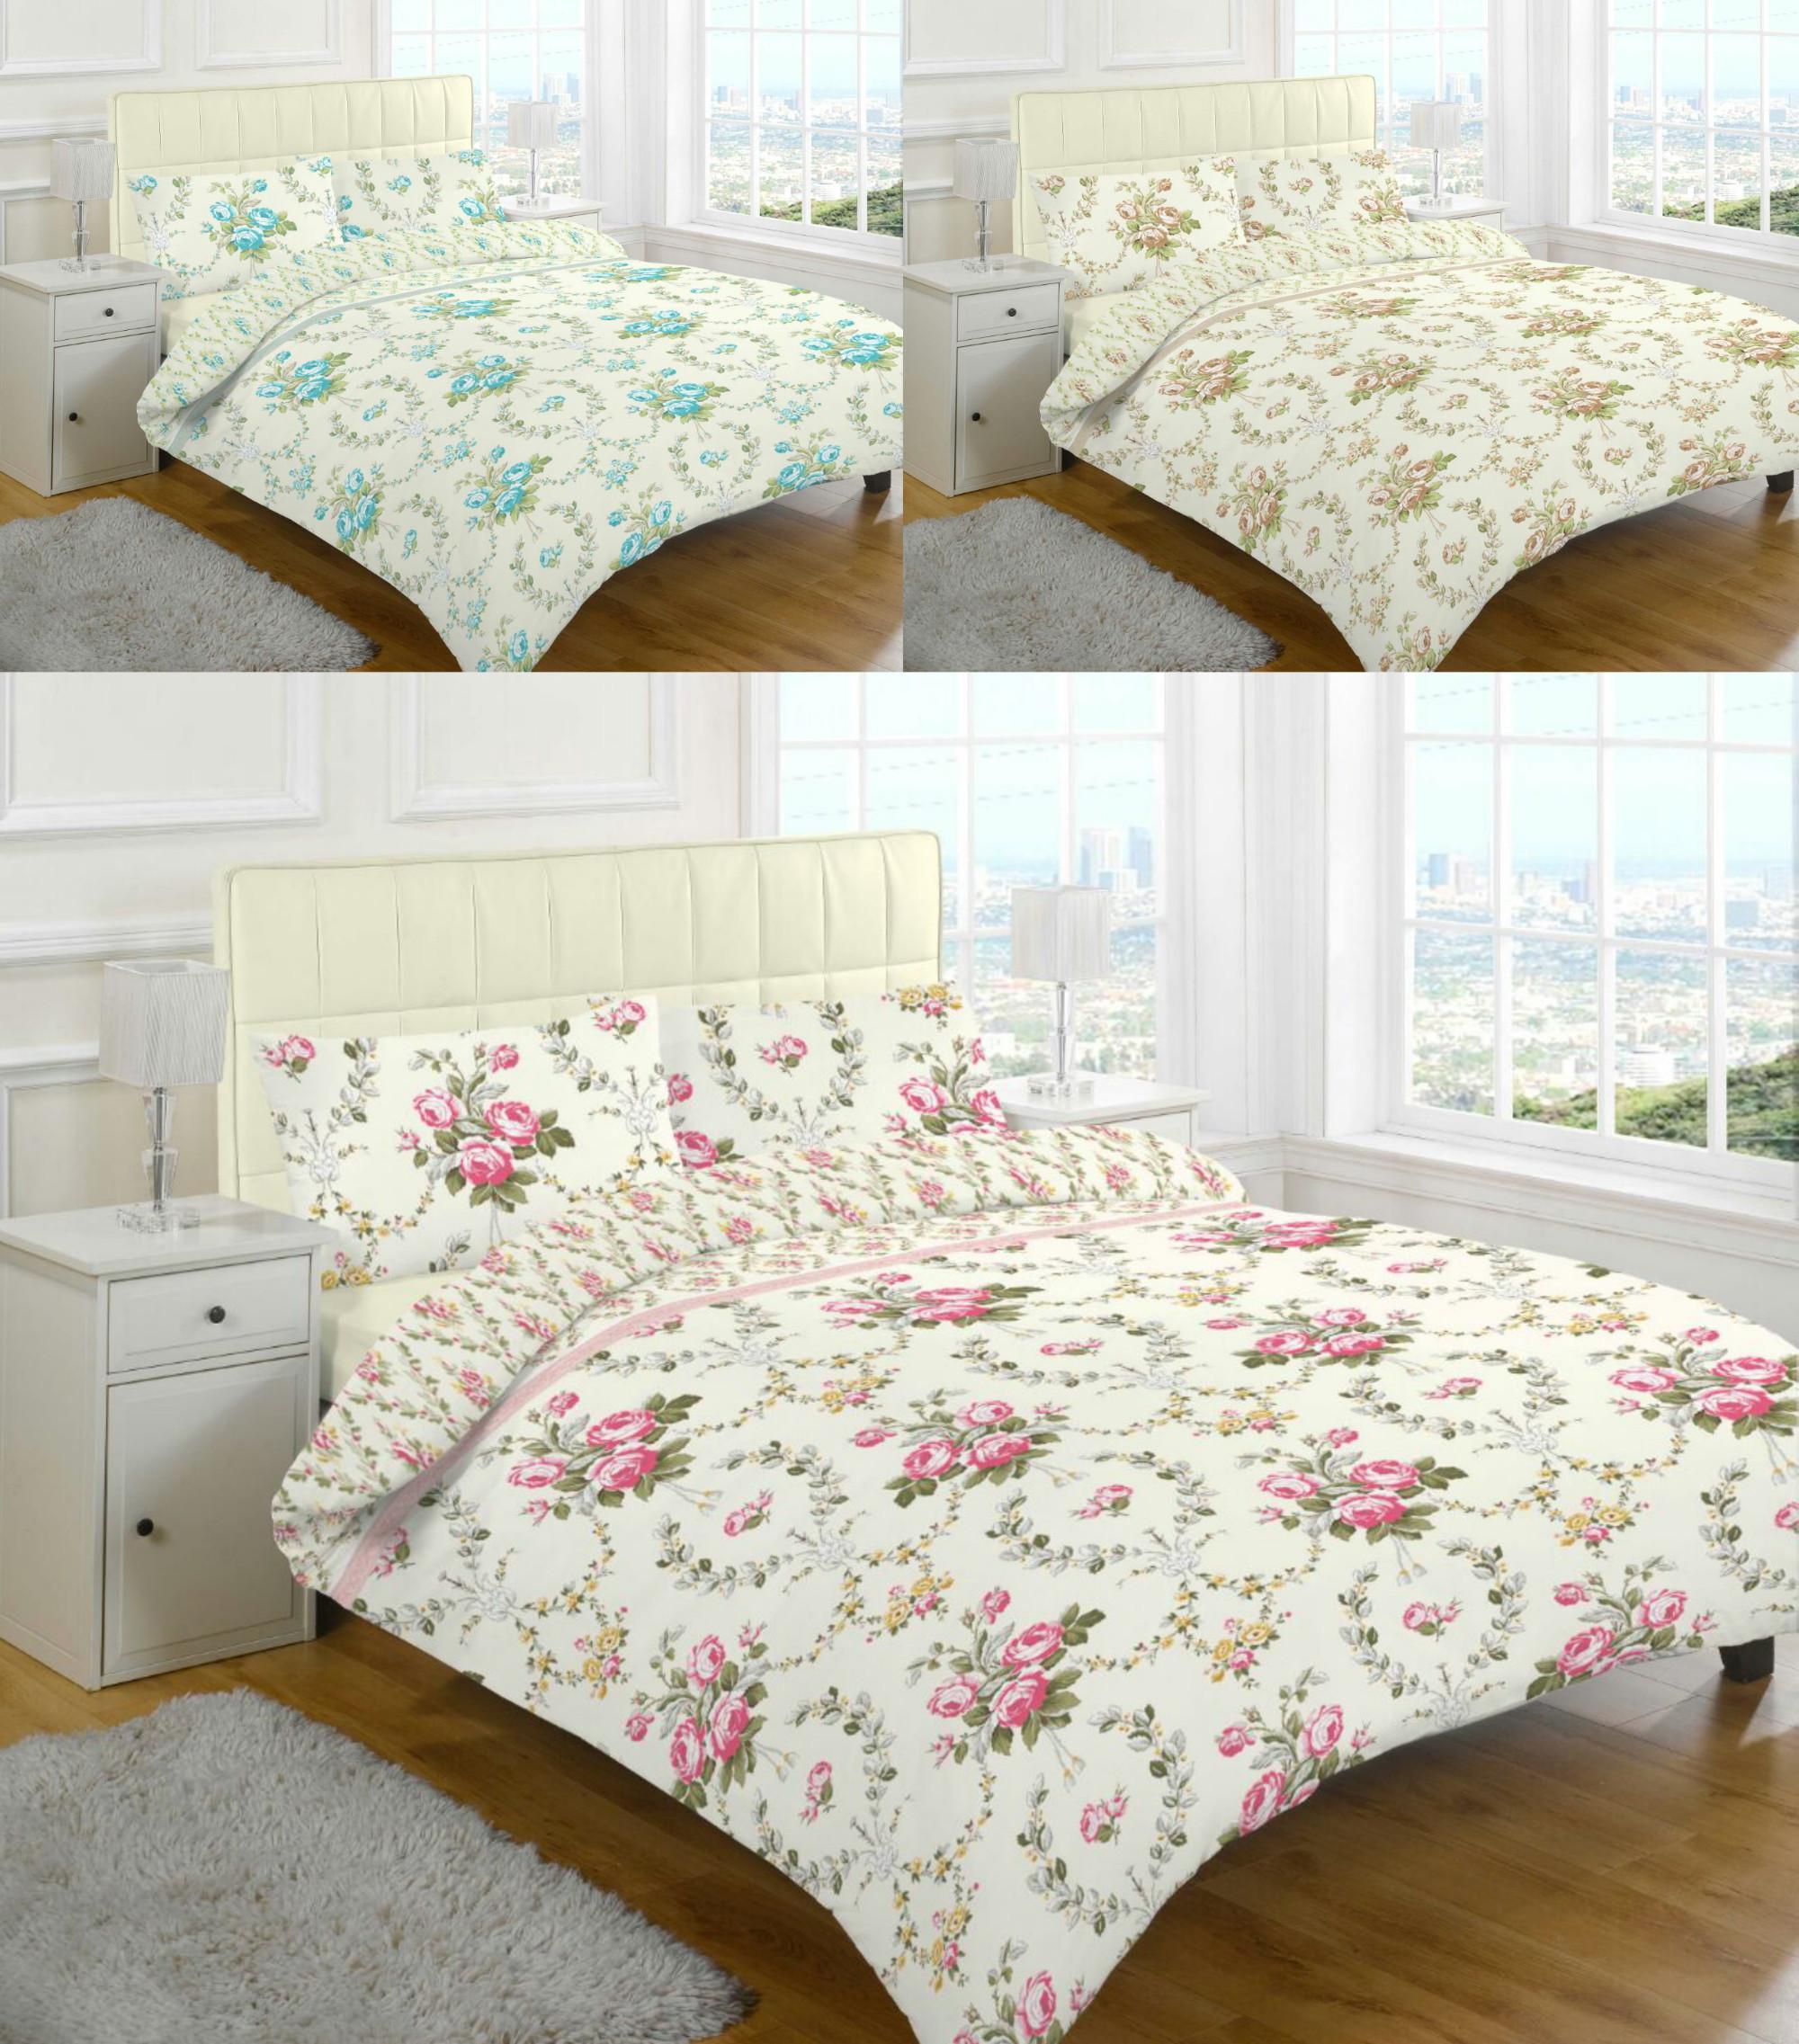 Olivia Floral Brushed Cotton Flannelette Thermal Duvet Cover